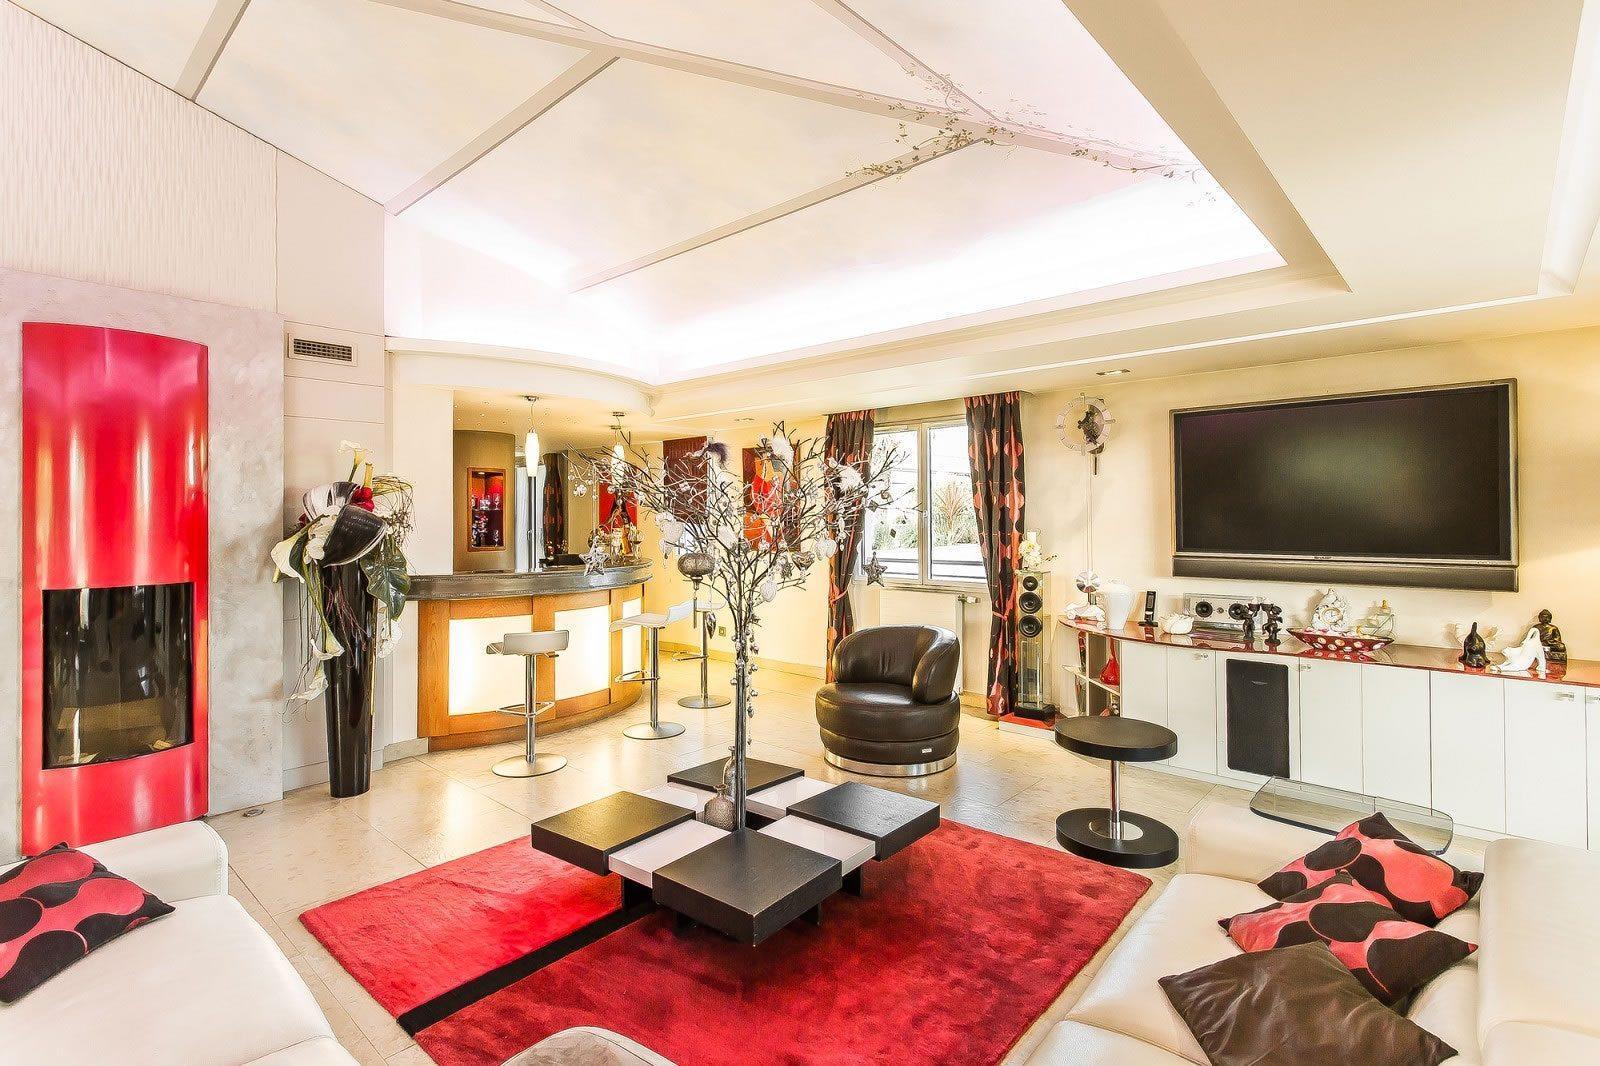 luxury bedrooms for sale joy studio design gallery best design. Black Bedroom Furniture Sets. Home Design Ideas